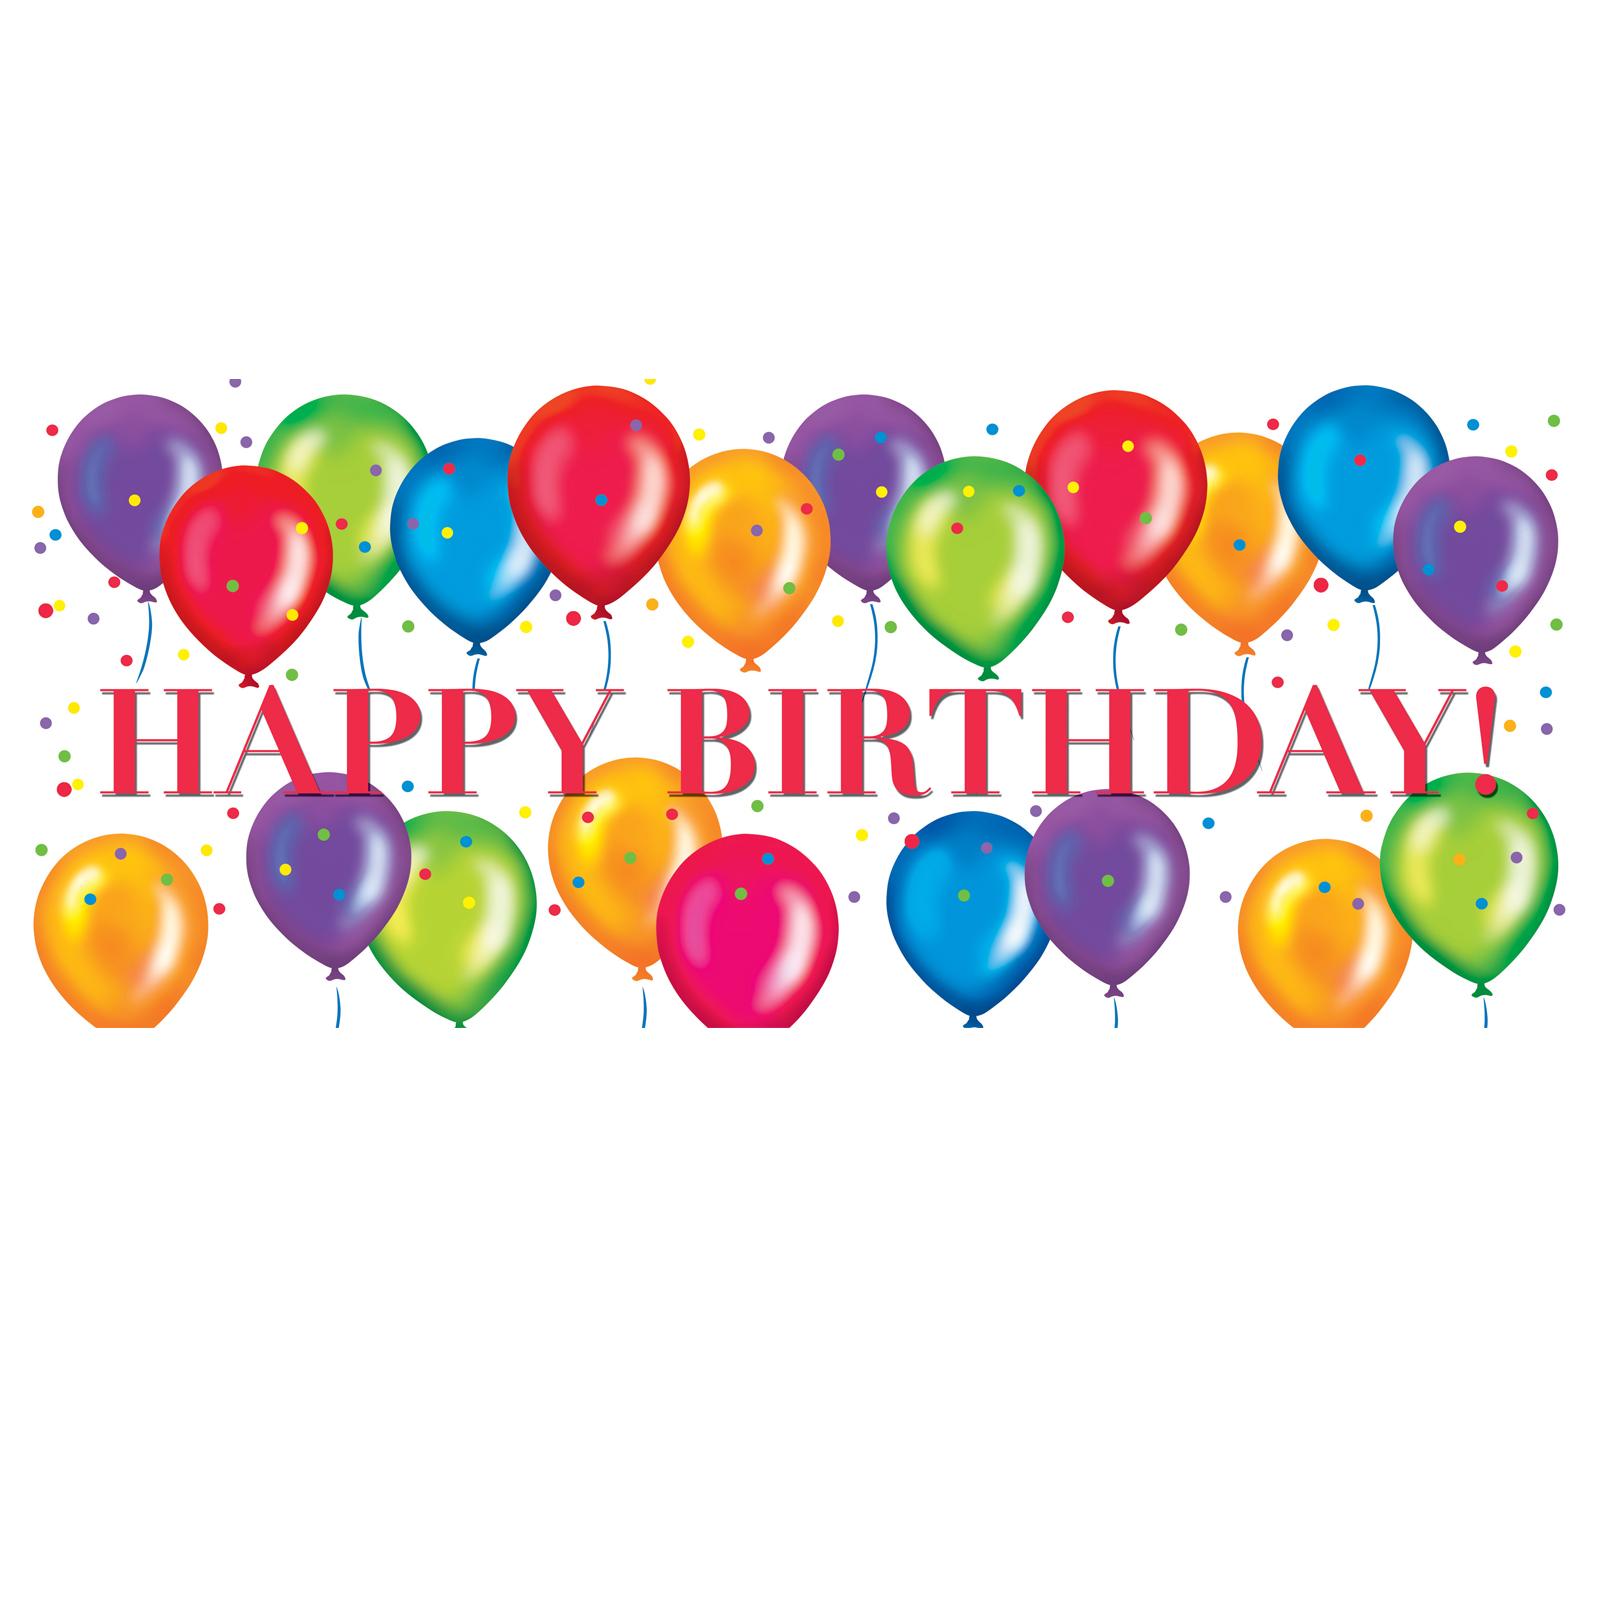 Happy birthday friend clipart 4